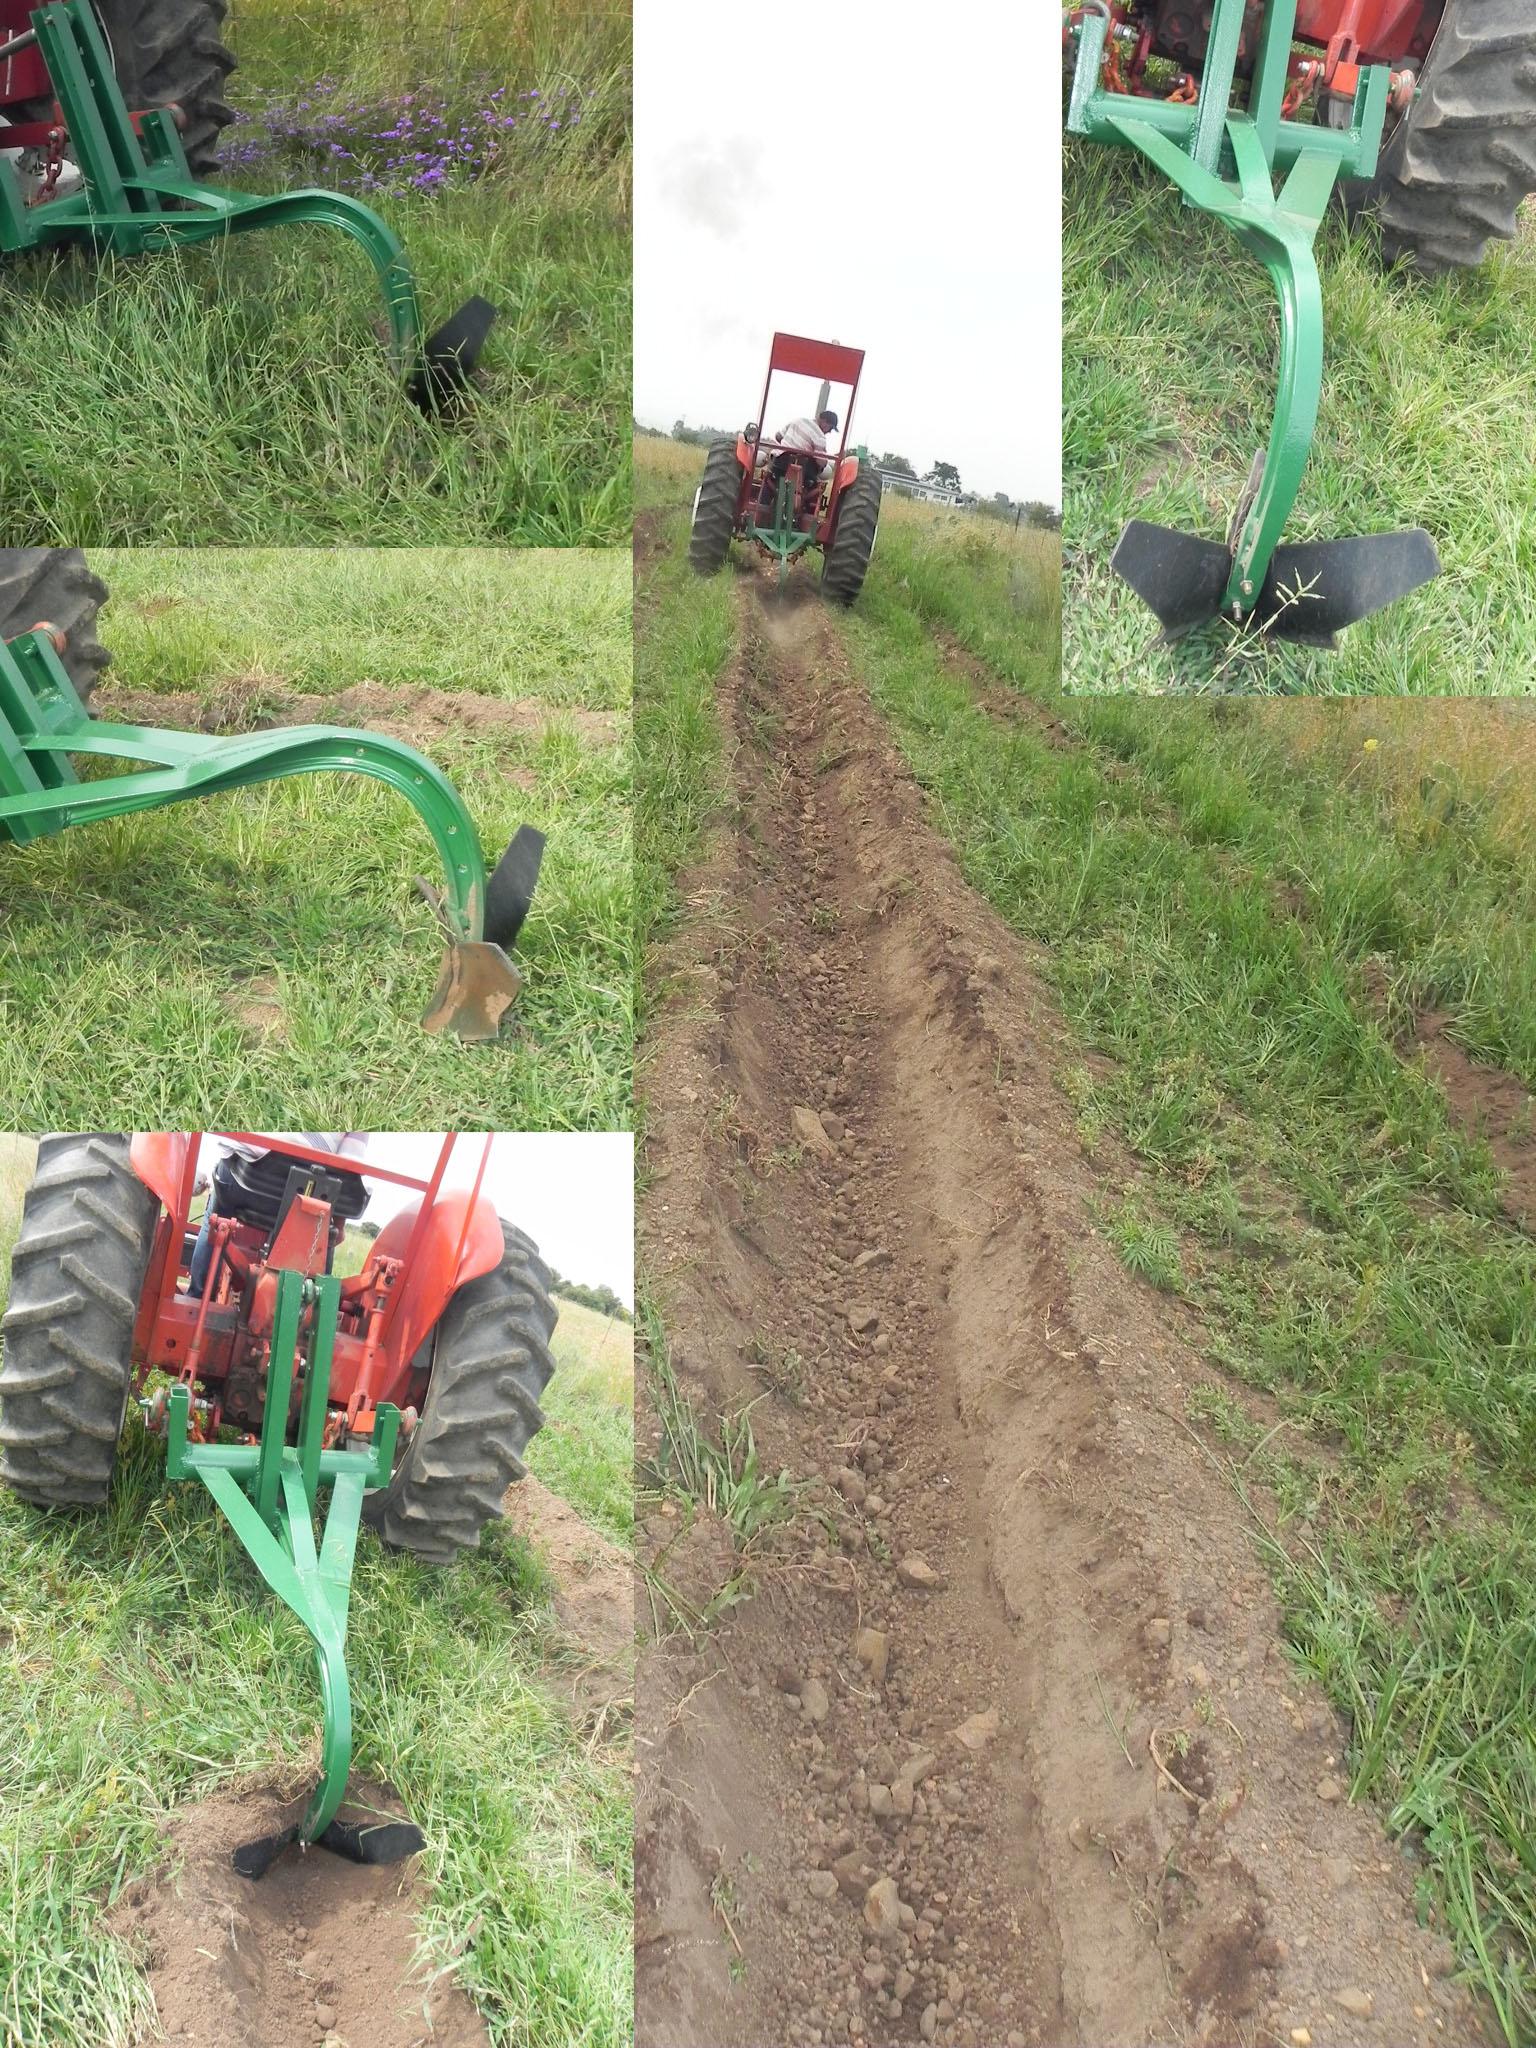 Trench digger (potato tiller)